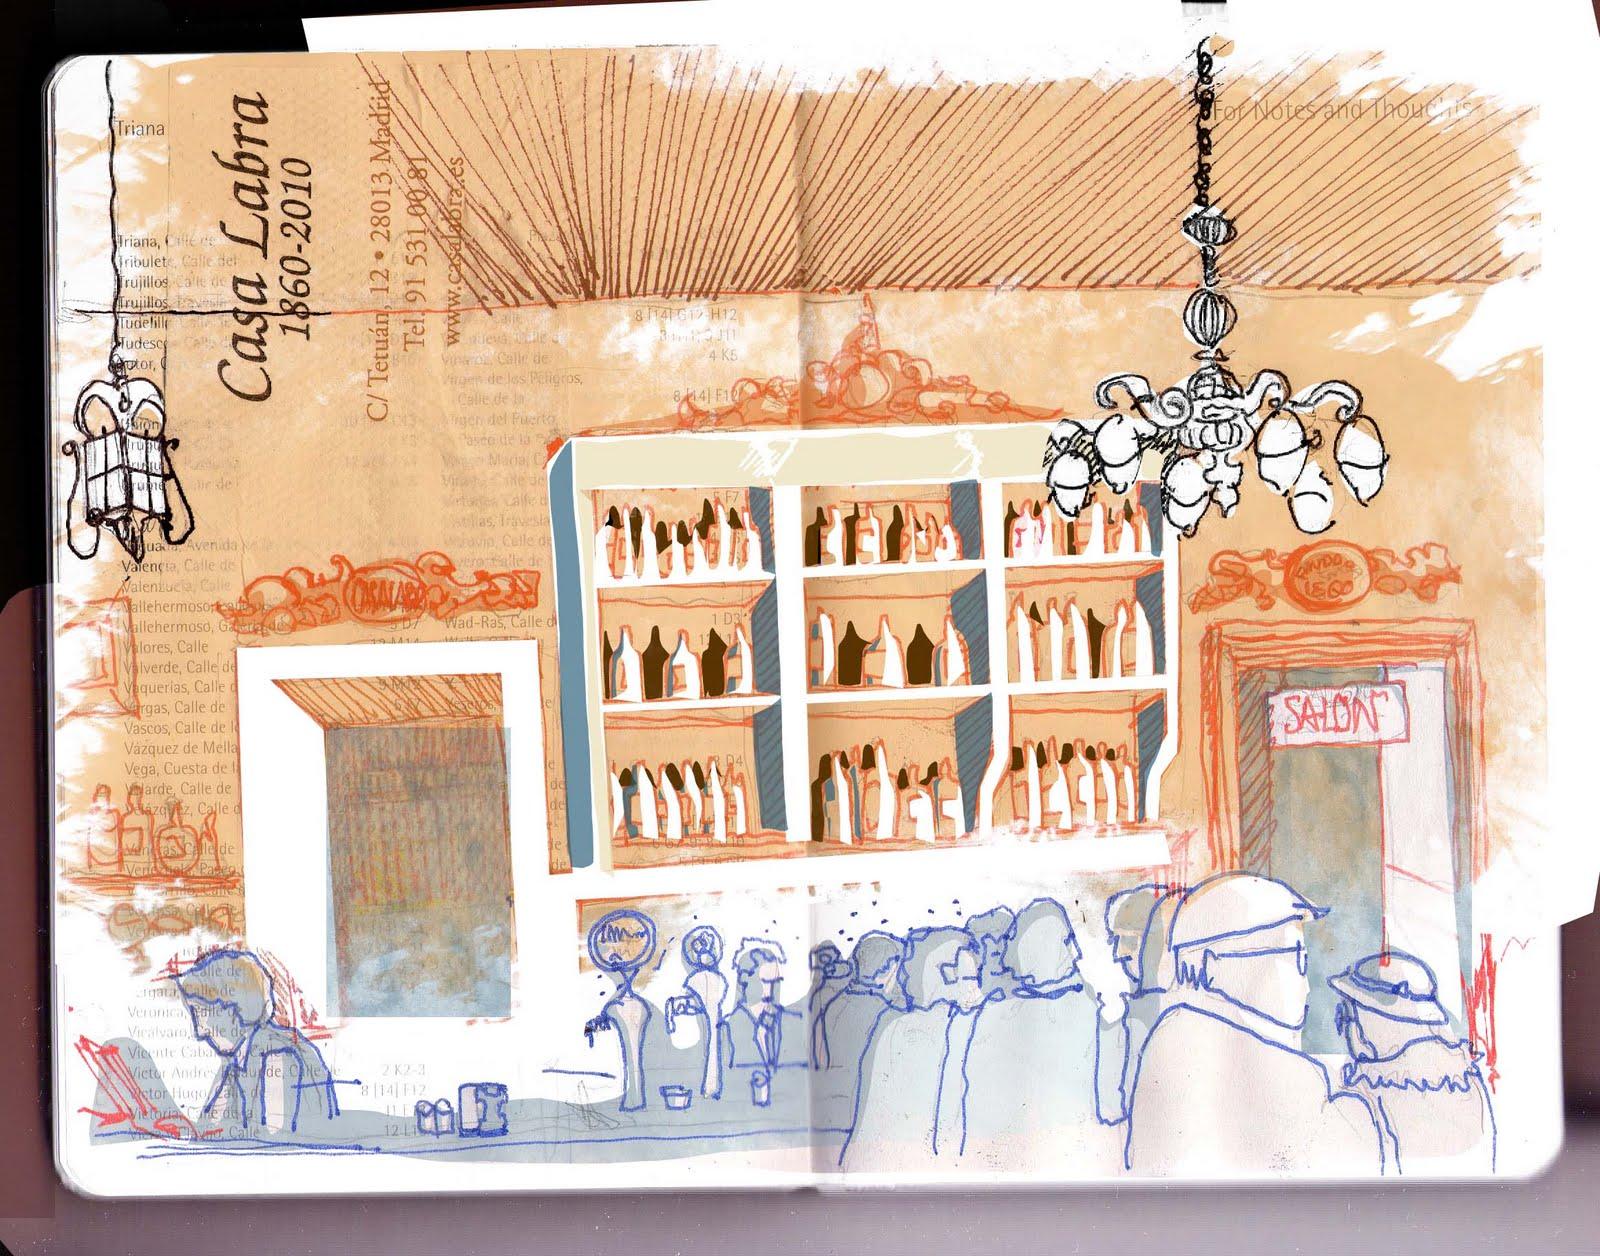 Dibujo de Casa Labra por Antonio Rodríguez Ledesma